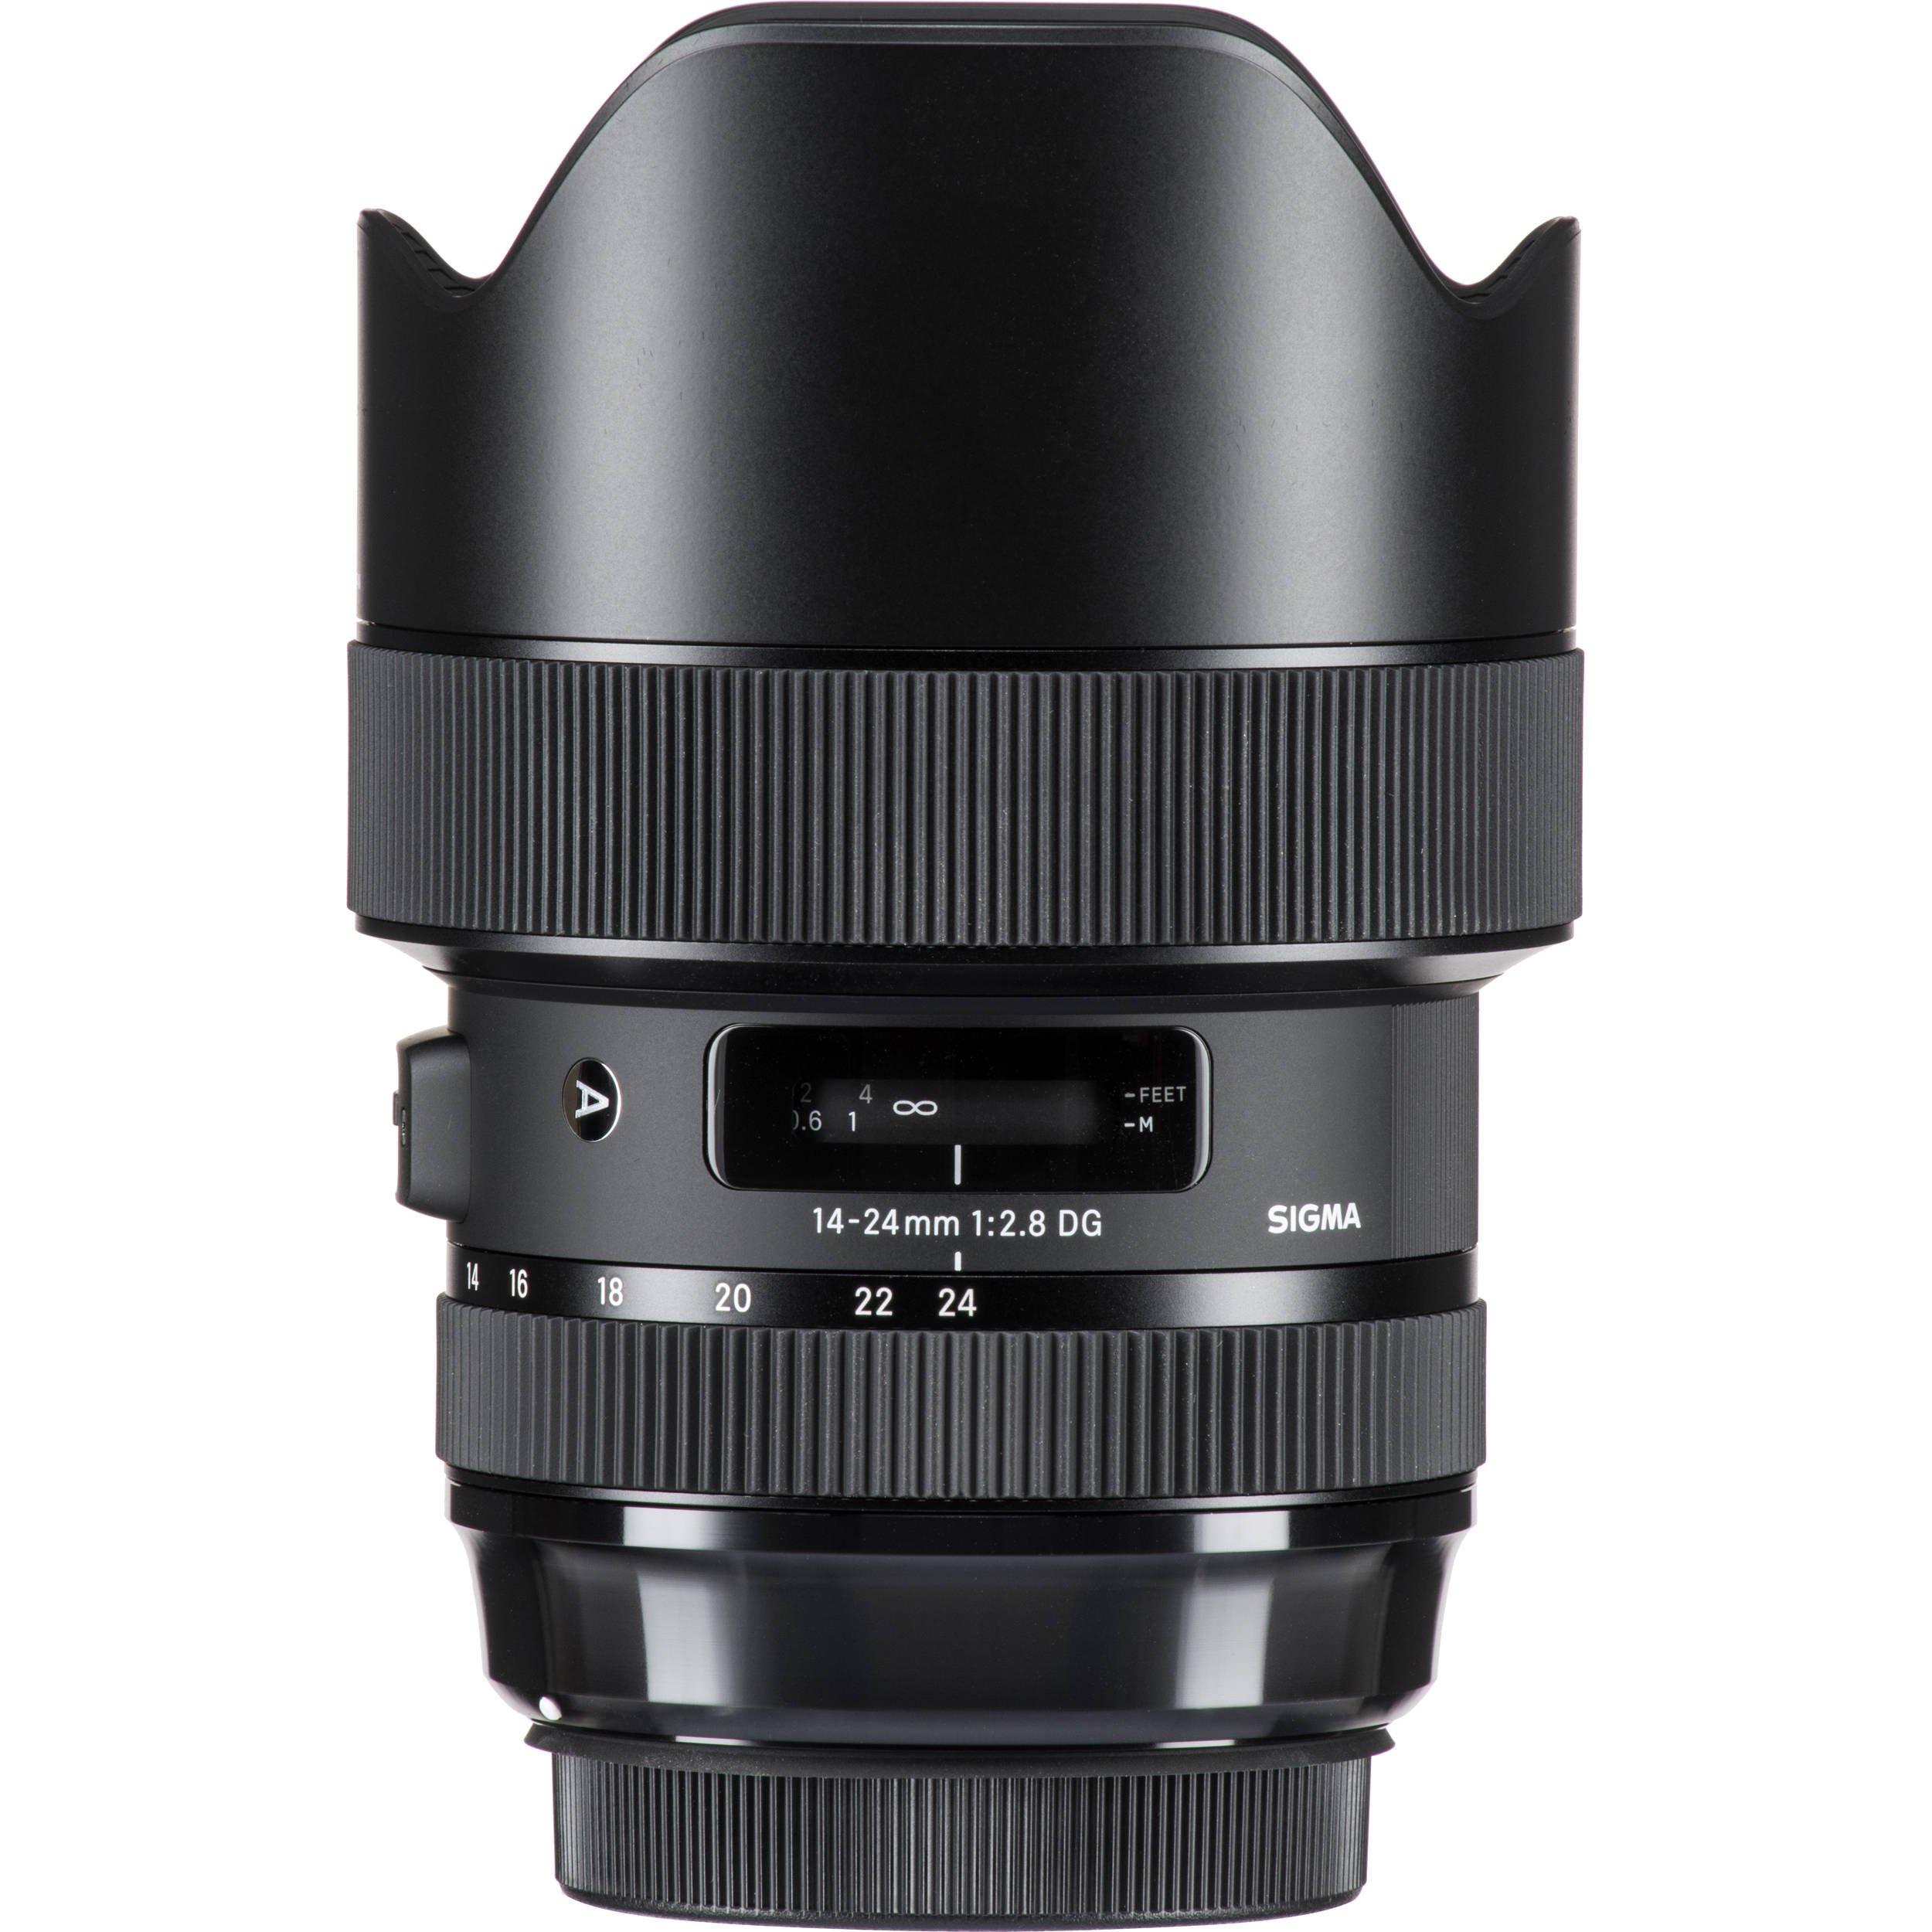 Sigma 14-24mm f/2.8 DG HSM Art Lens for Nikon F – 6PC Accessory Bundle by Sigma (Image #2)